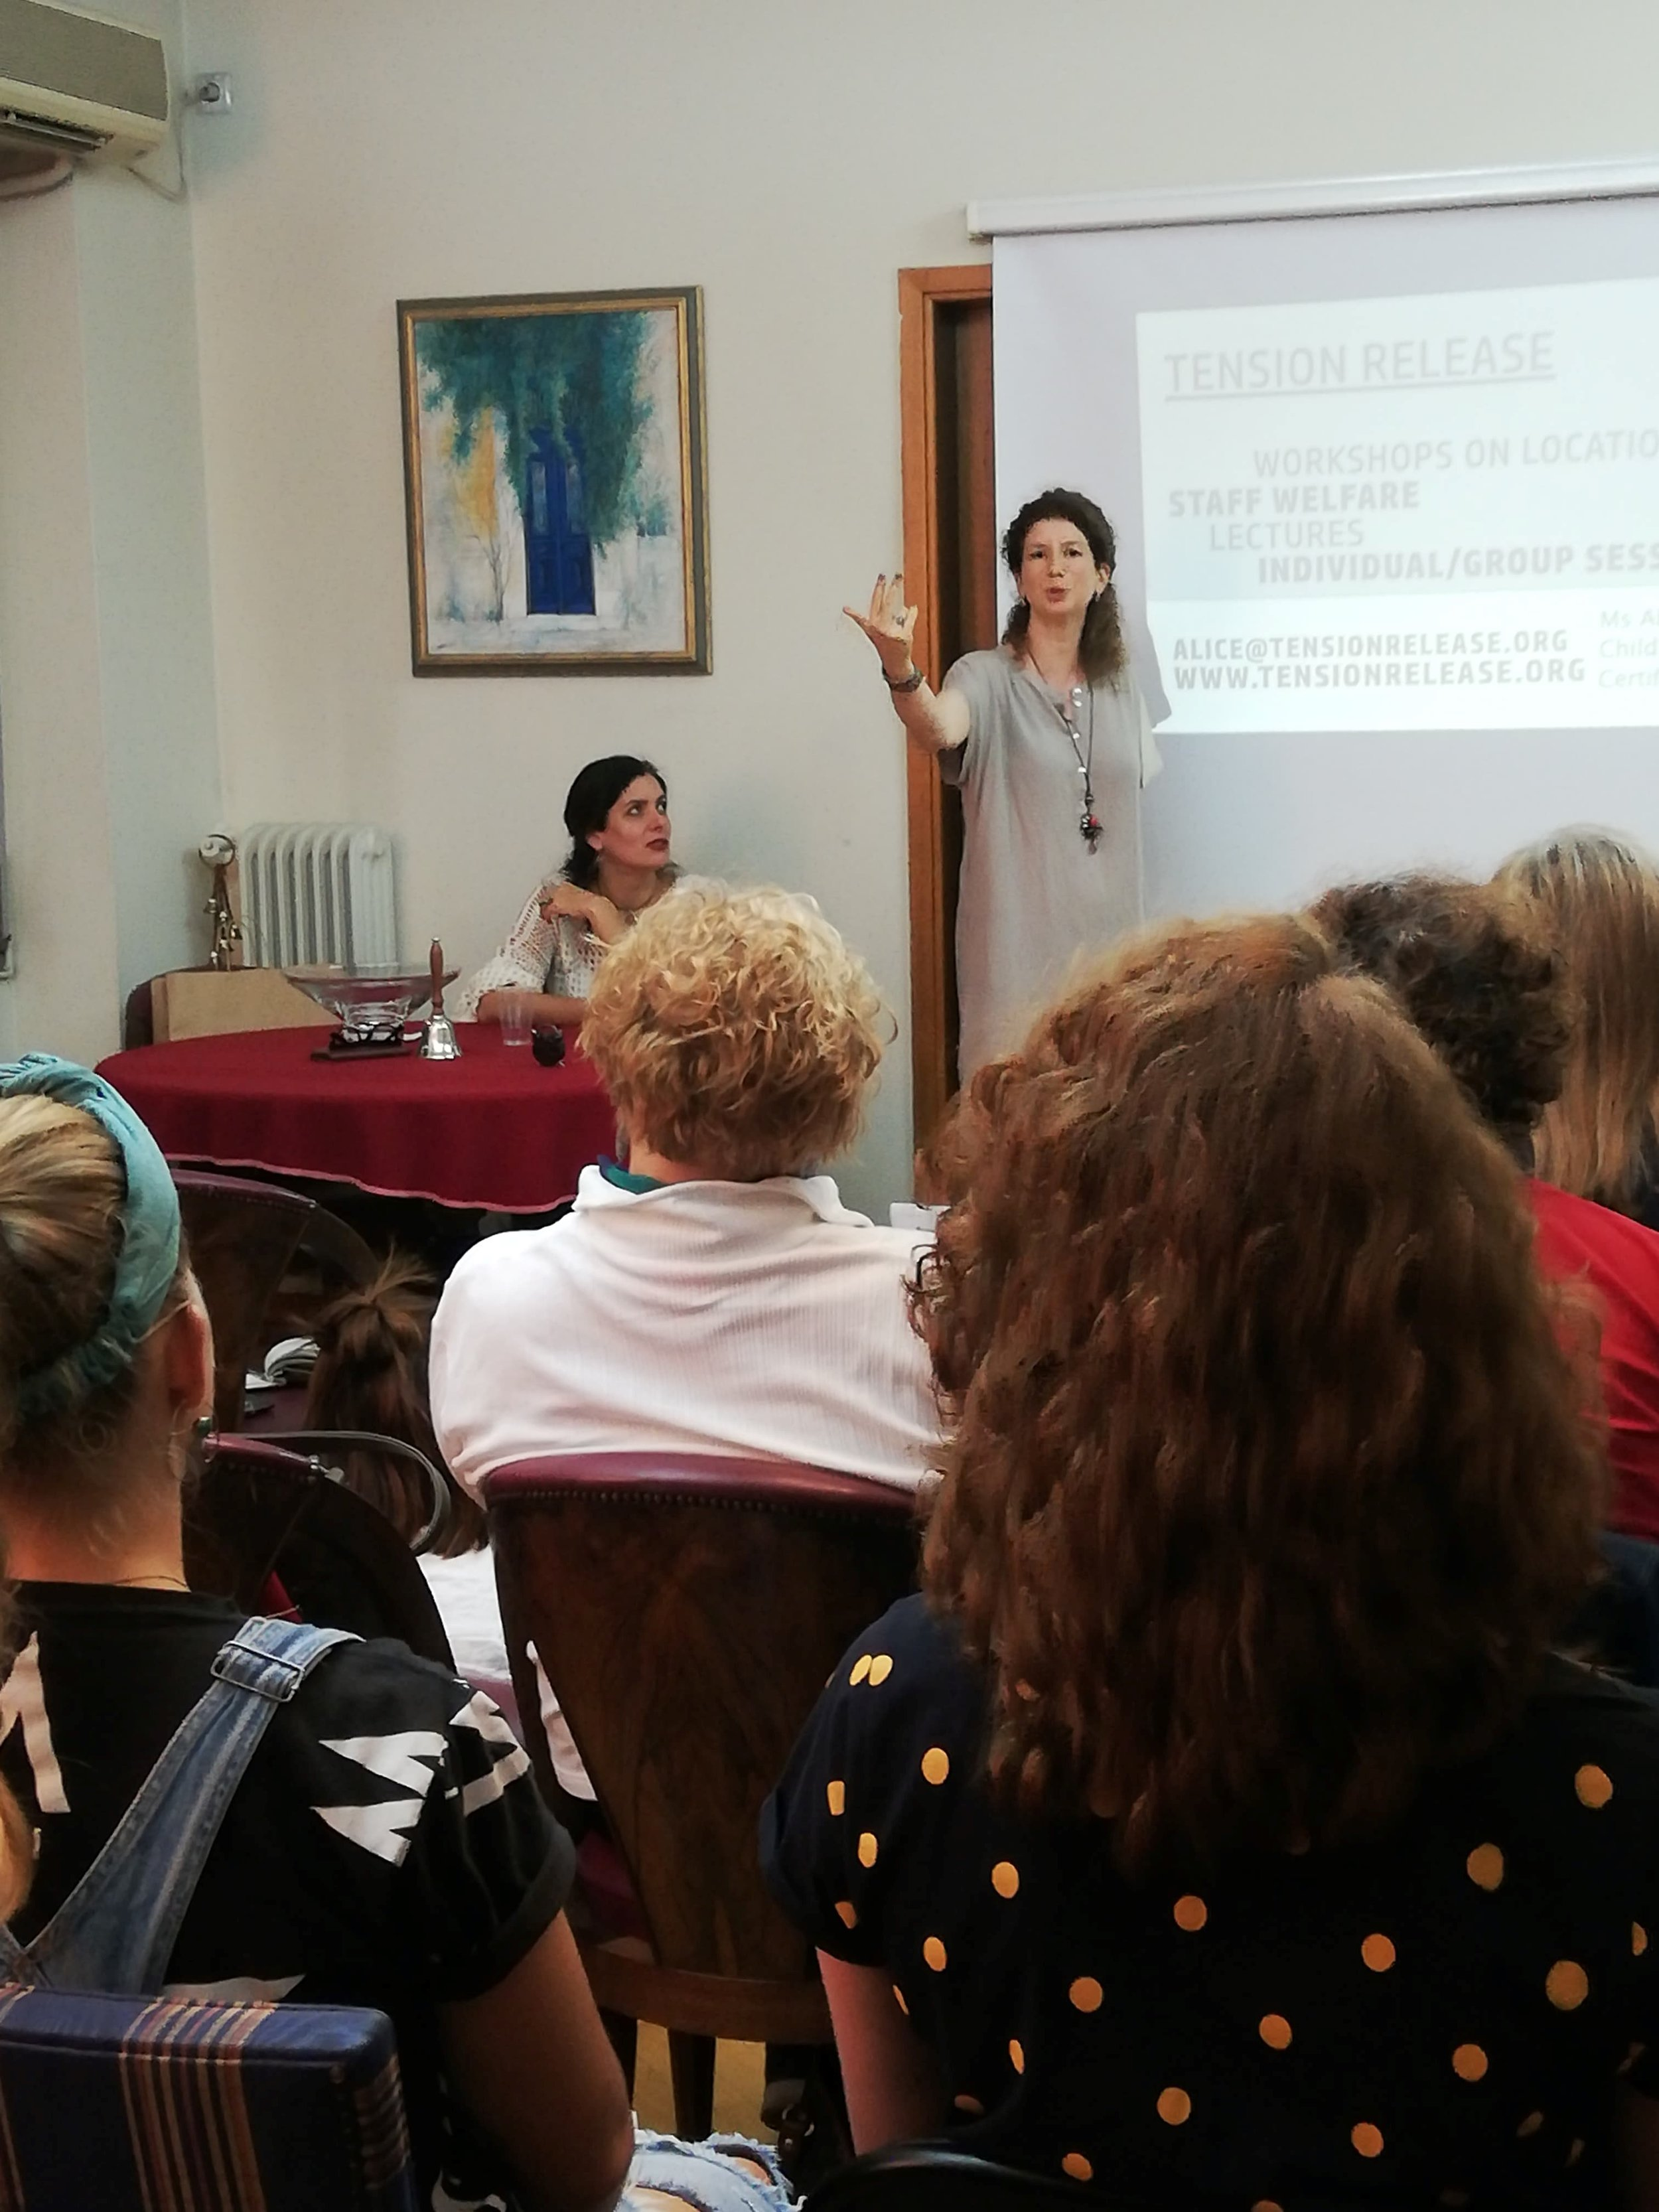 Lecture: Regaining Life after Stress or Trauma Nov 2019 Athens, Greece